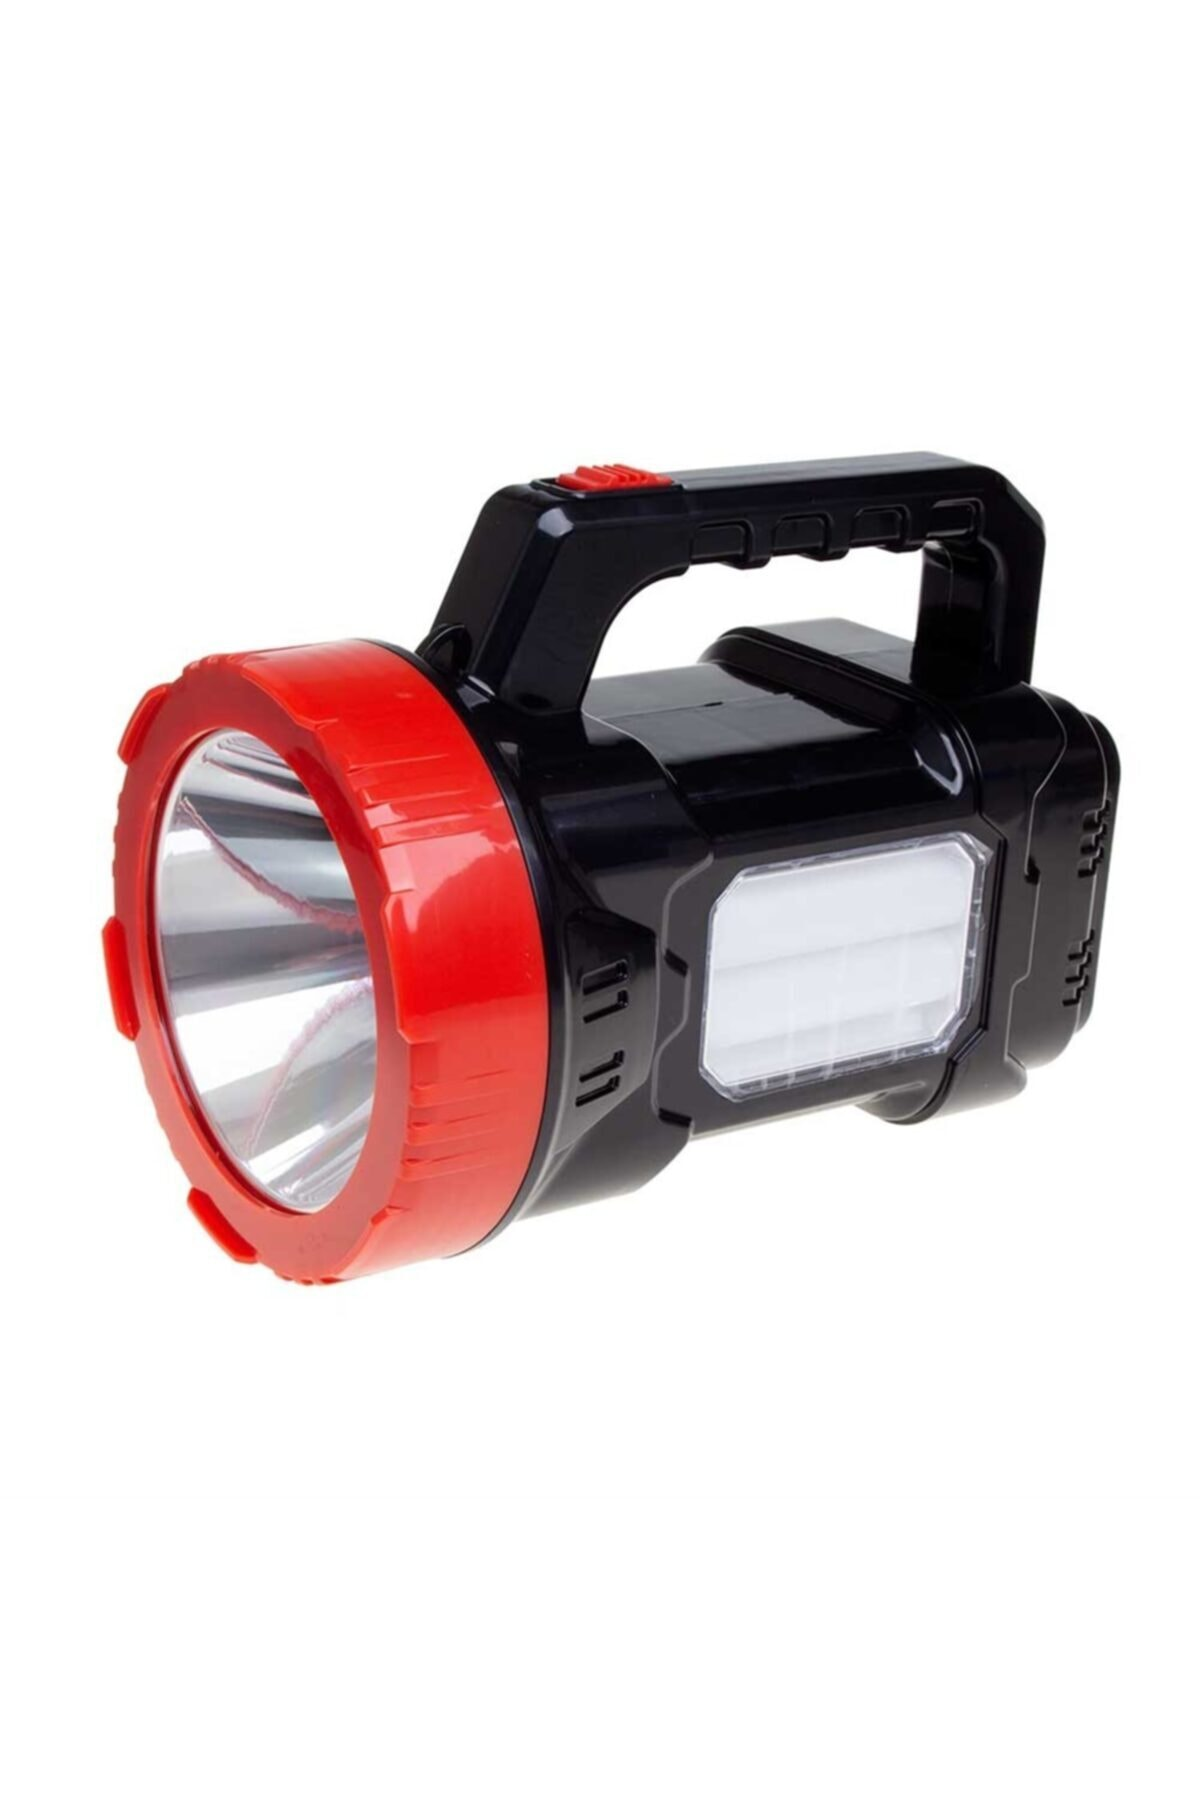 Gold orion Projektör Tipi Şarjlı Led El Feneri 10 Watt Fiyatı, Yorumları -  TRENDYOL